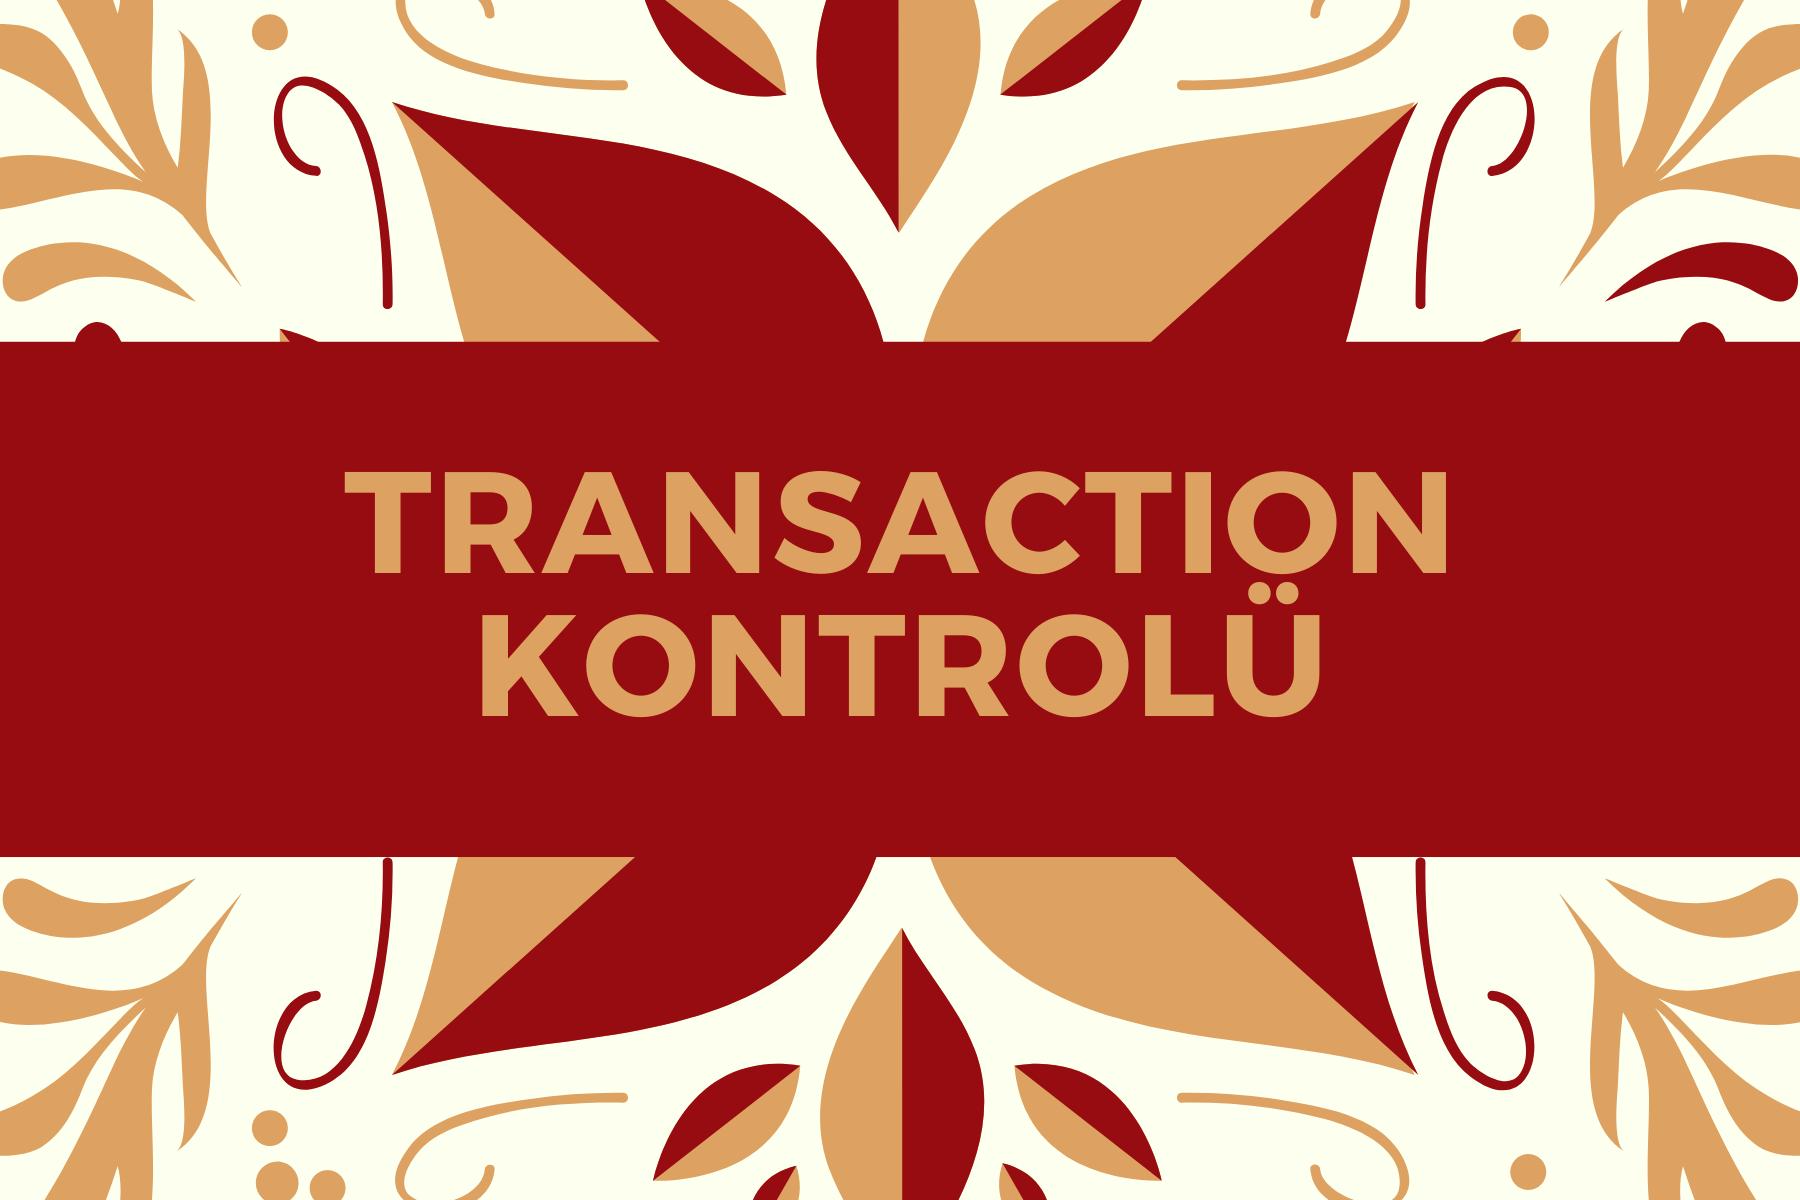 Transaction Kontrolü